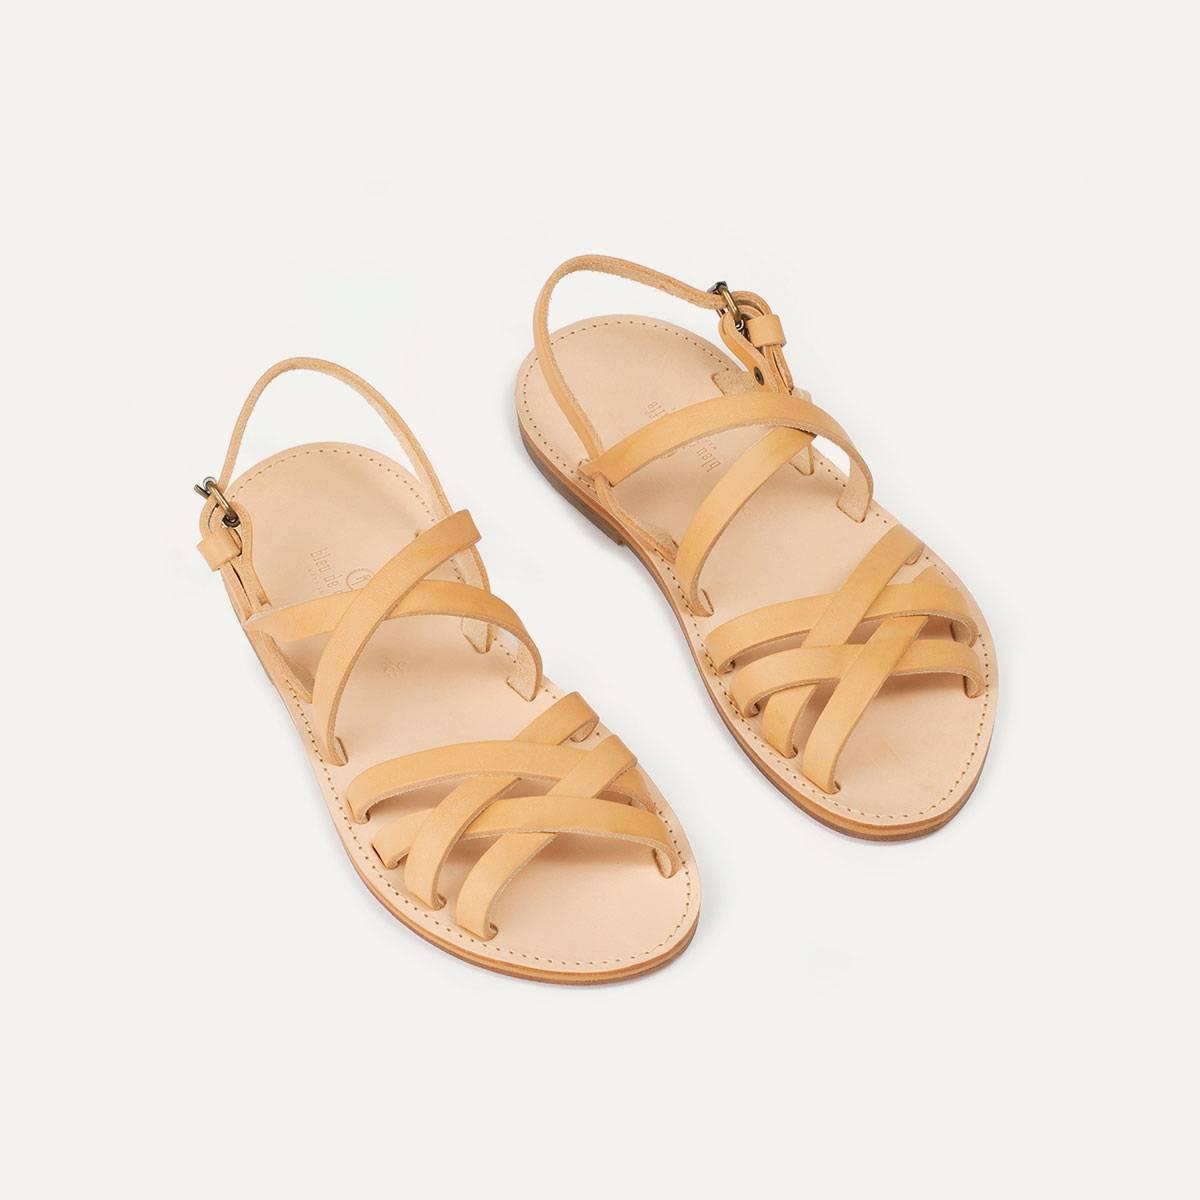 Sandales cuir Majour - Naturel (image n°3)